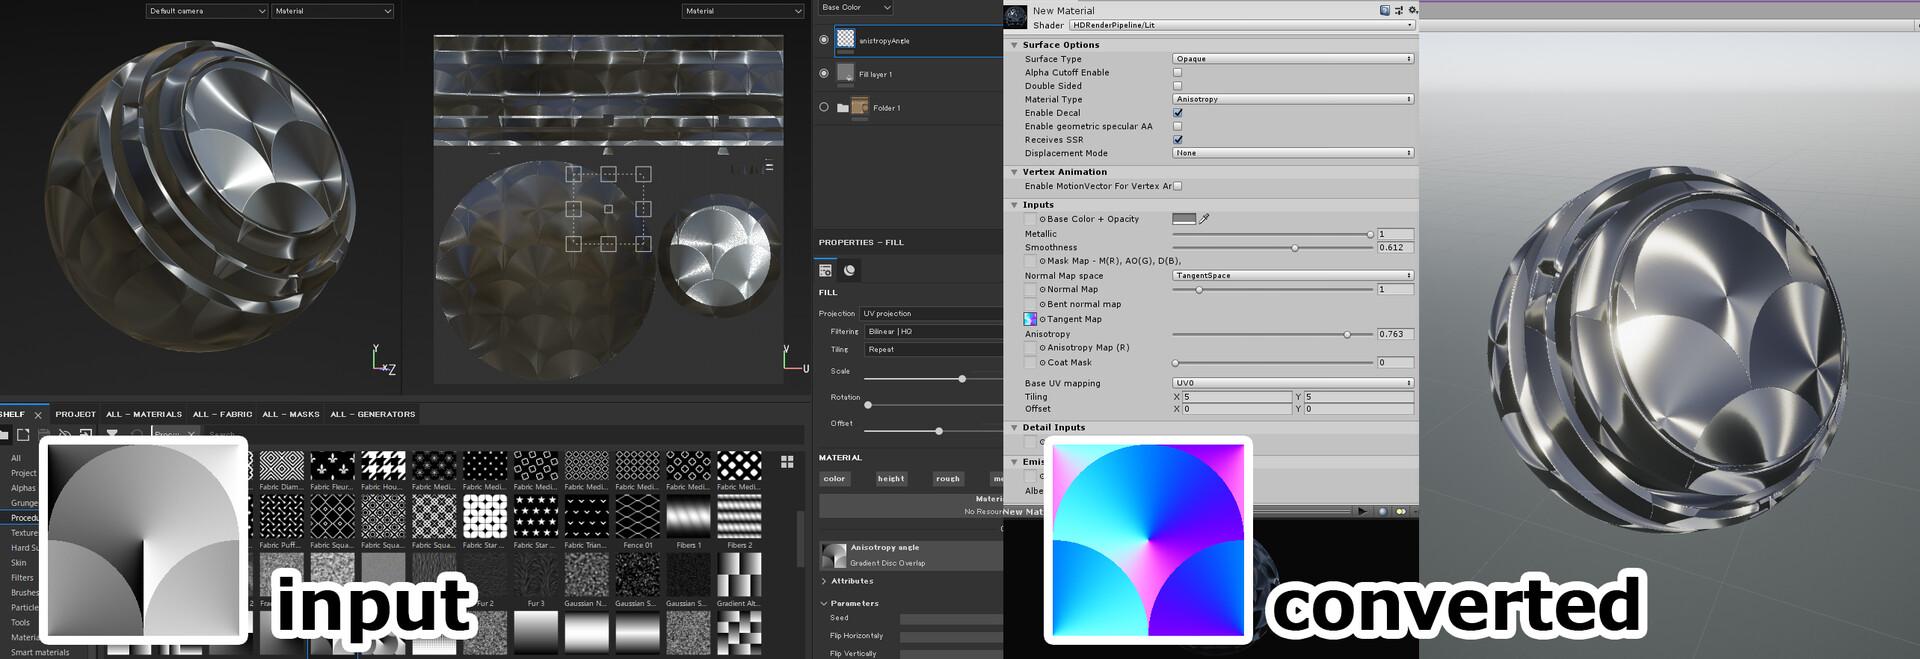 ArtStation - Anisotropy Conversion Generator for Substance Painter